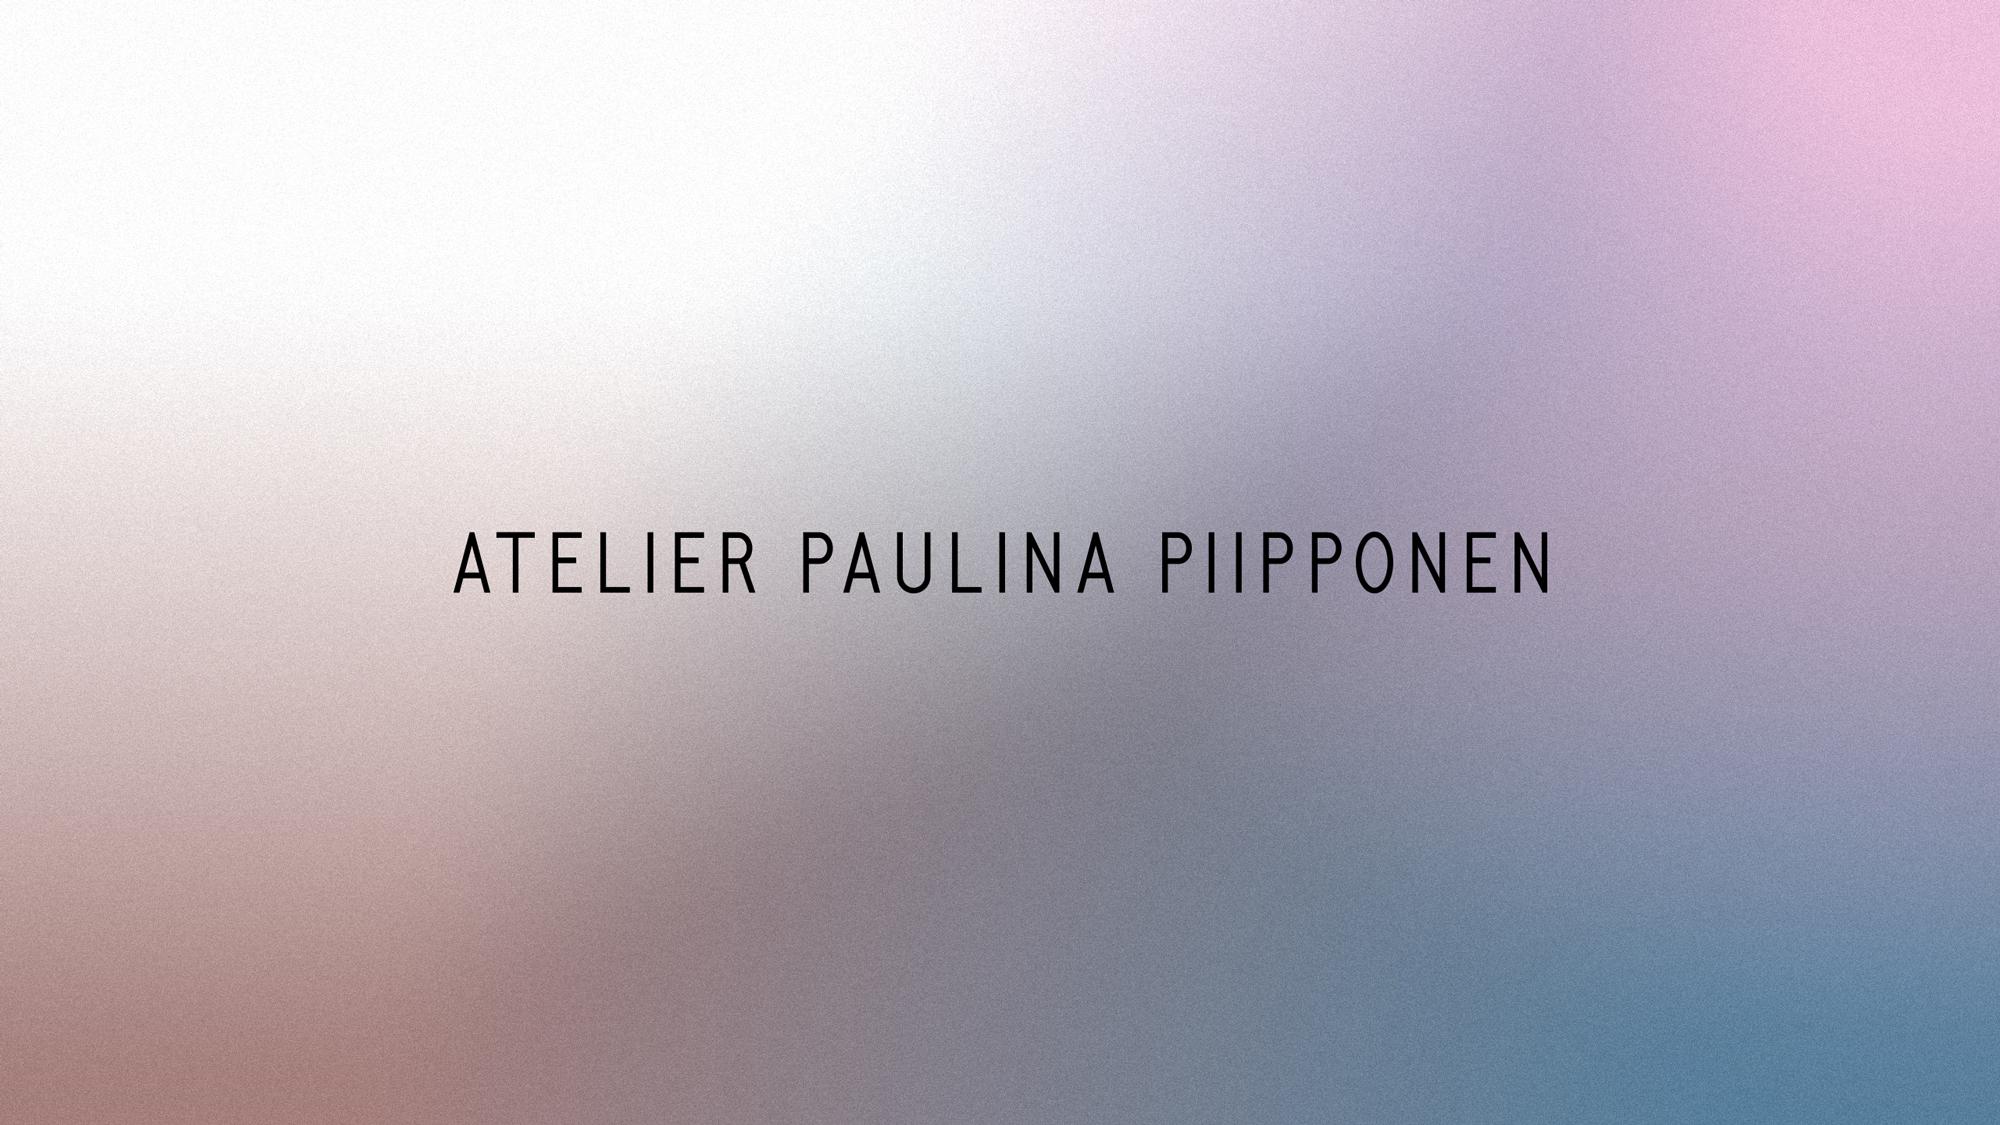 Cover image: Atelier Paulina Piipponen